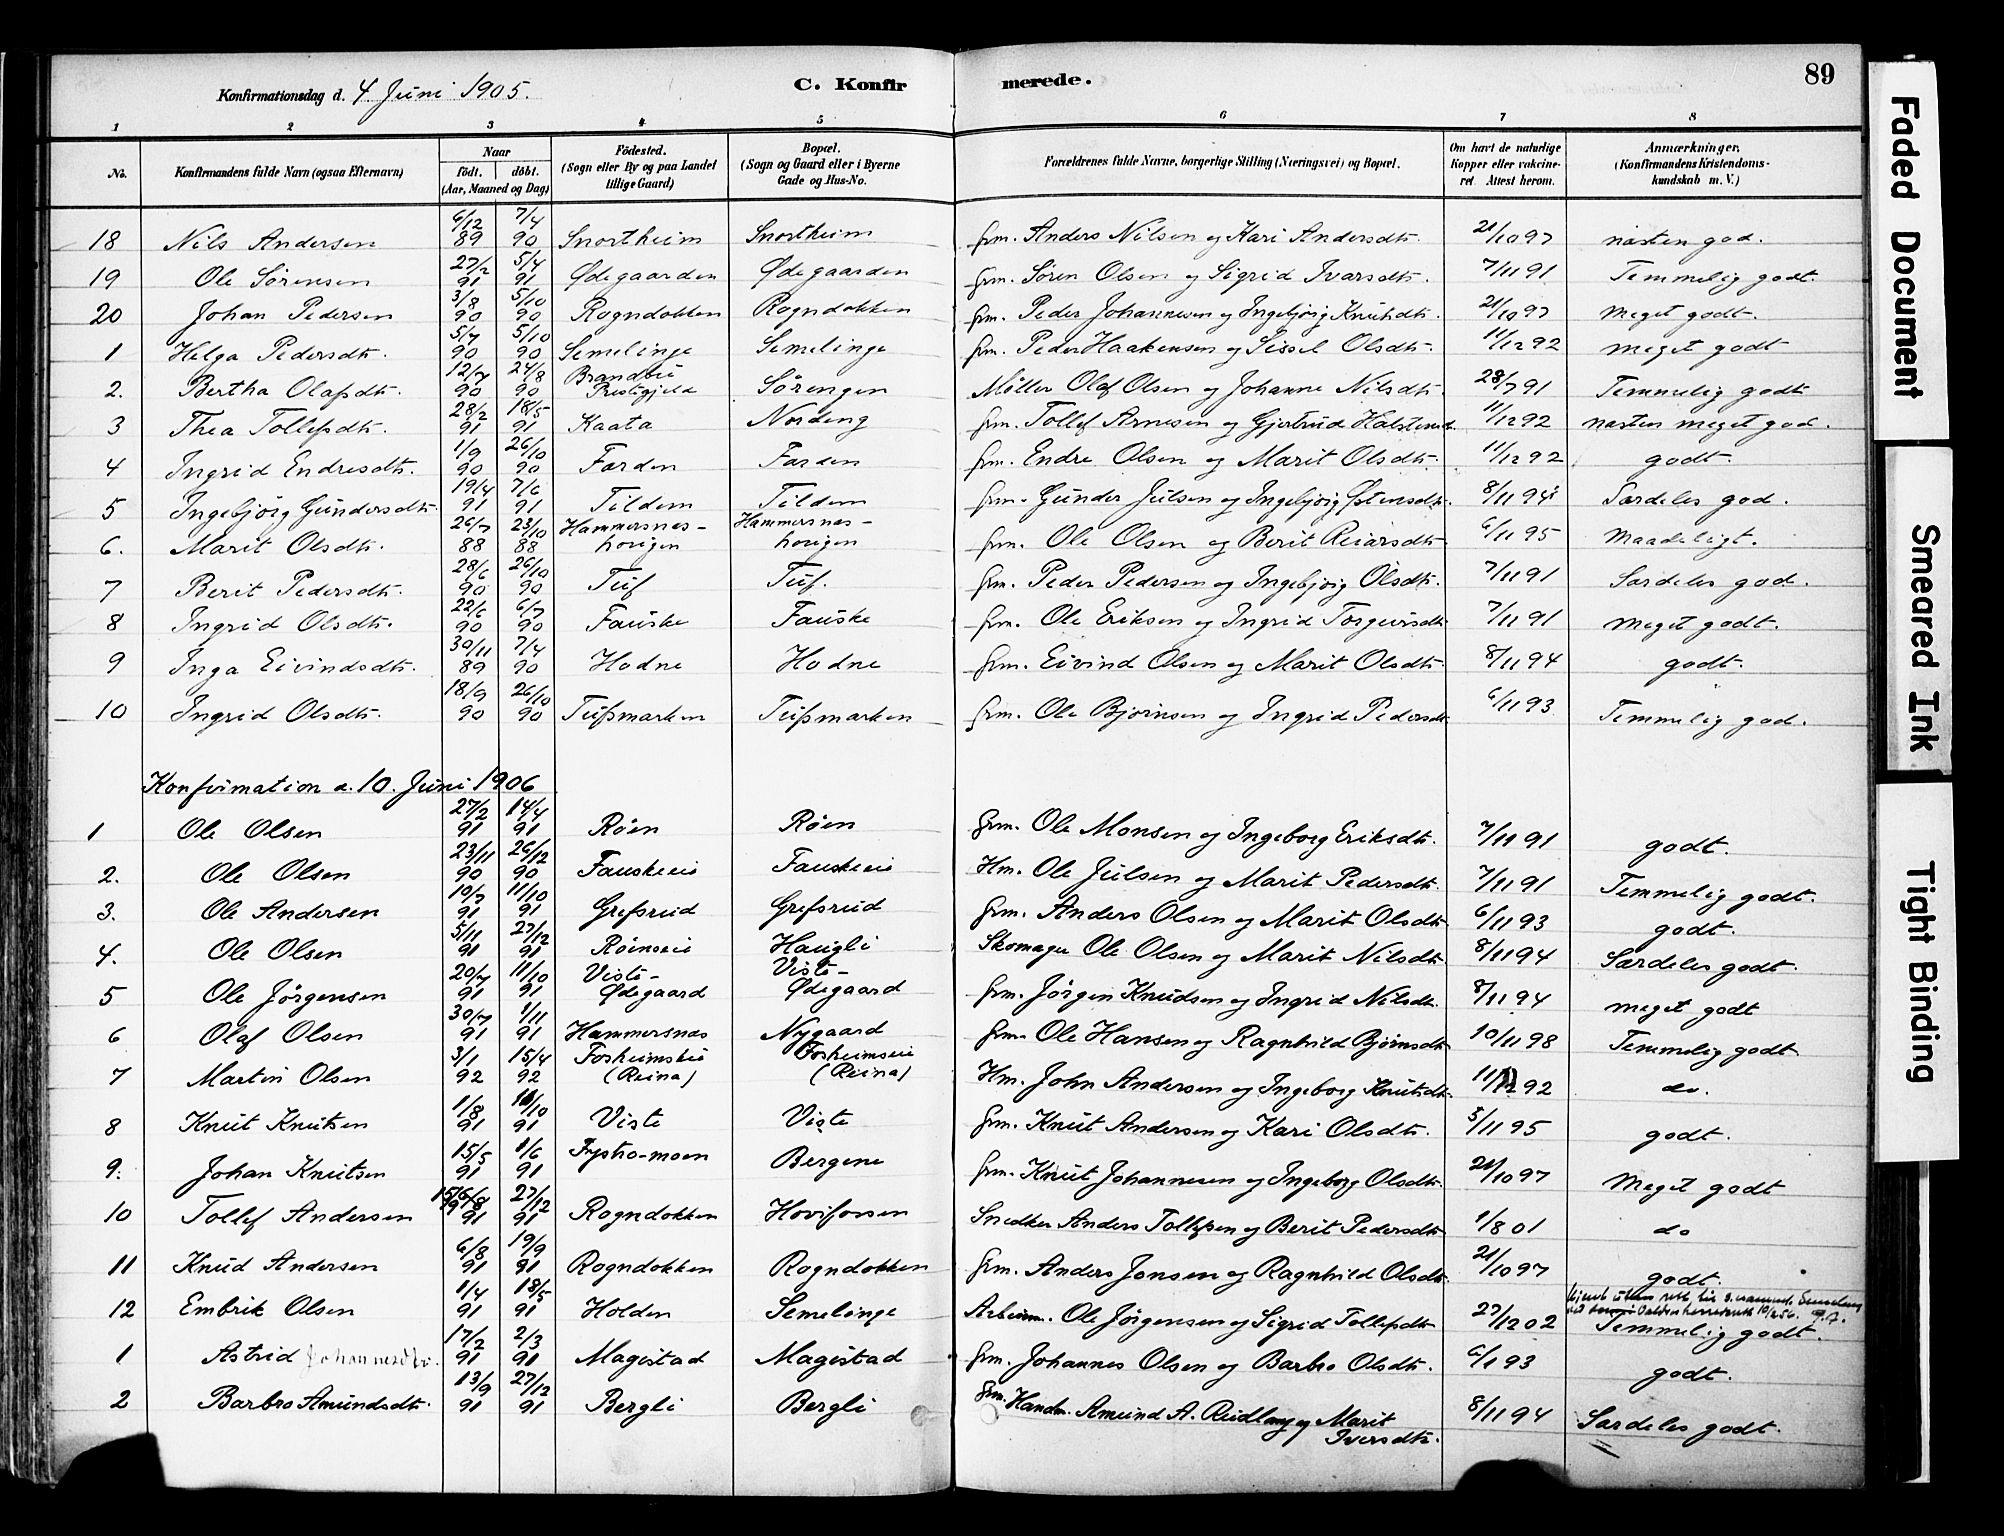 SAH, Vestre Slidre prestekontor, Ministerialbok nr. 6, 1881-1912, s. 89